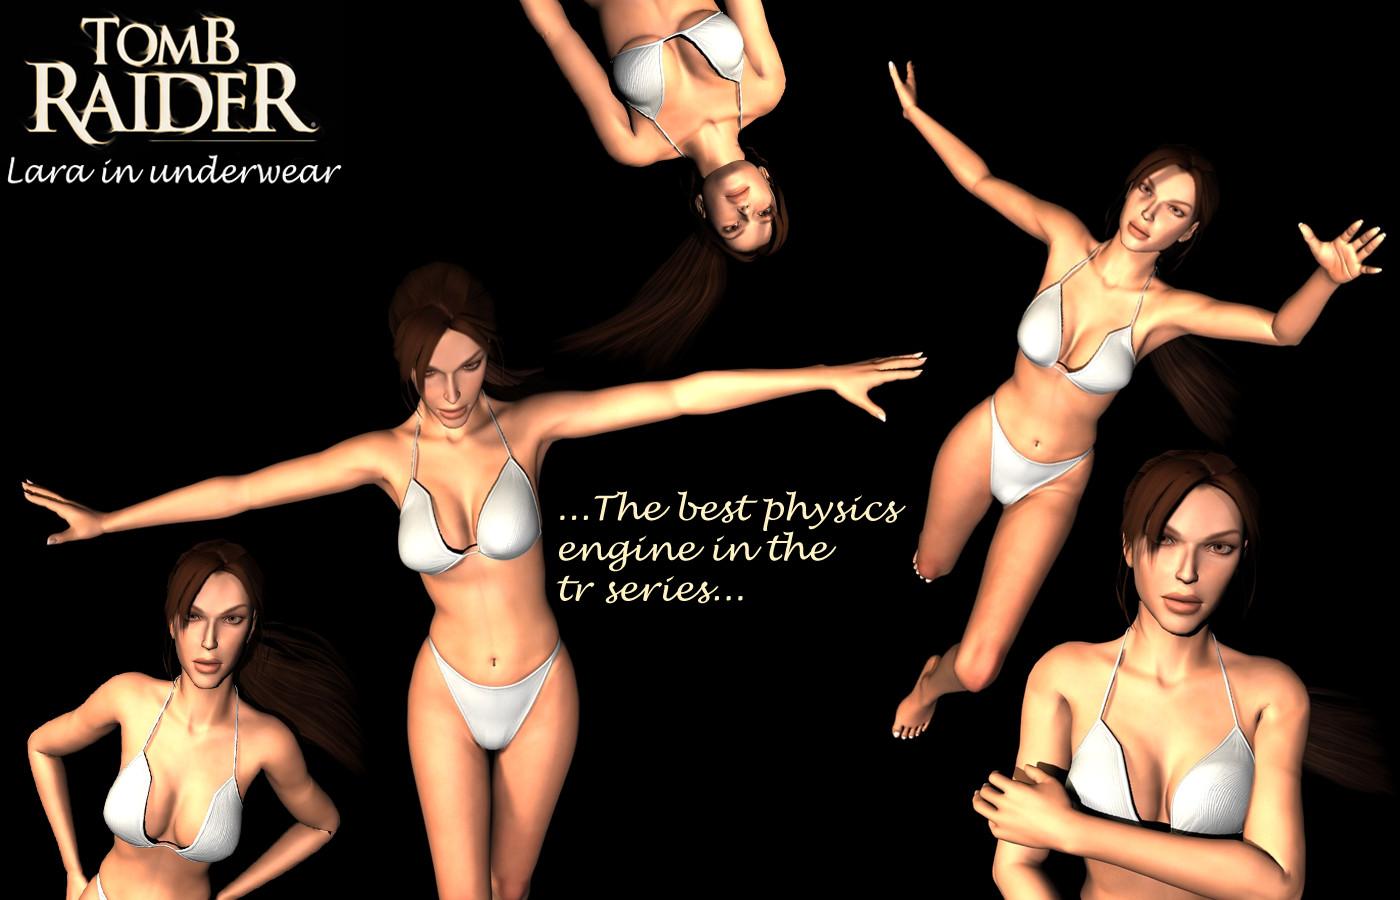 Tomb Raider : LIU 4 By Noonbob On DeviantArt